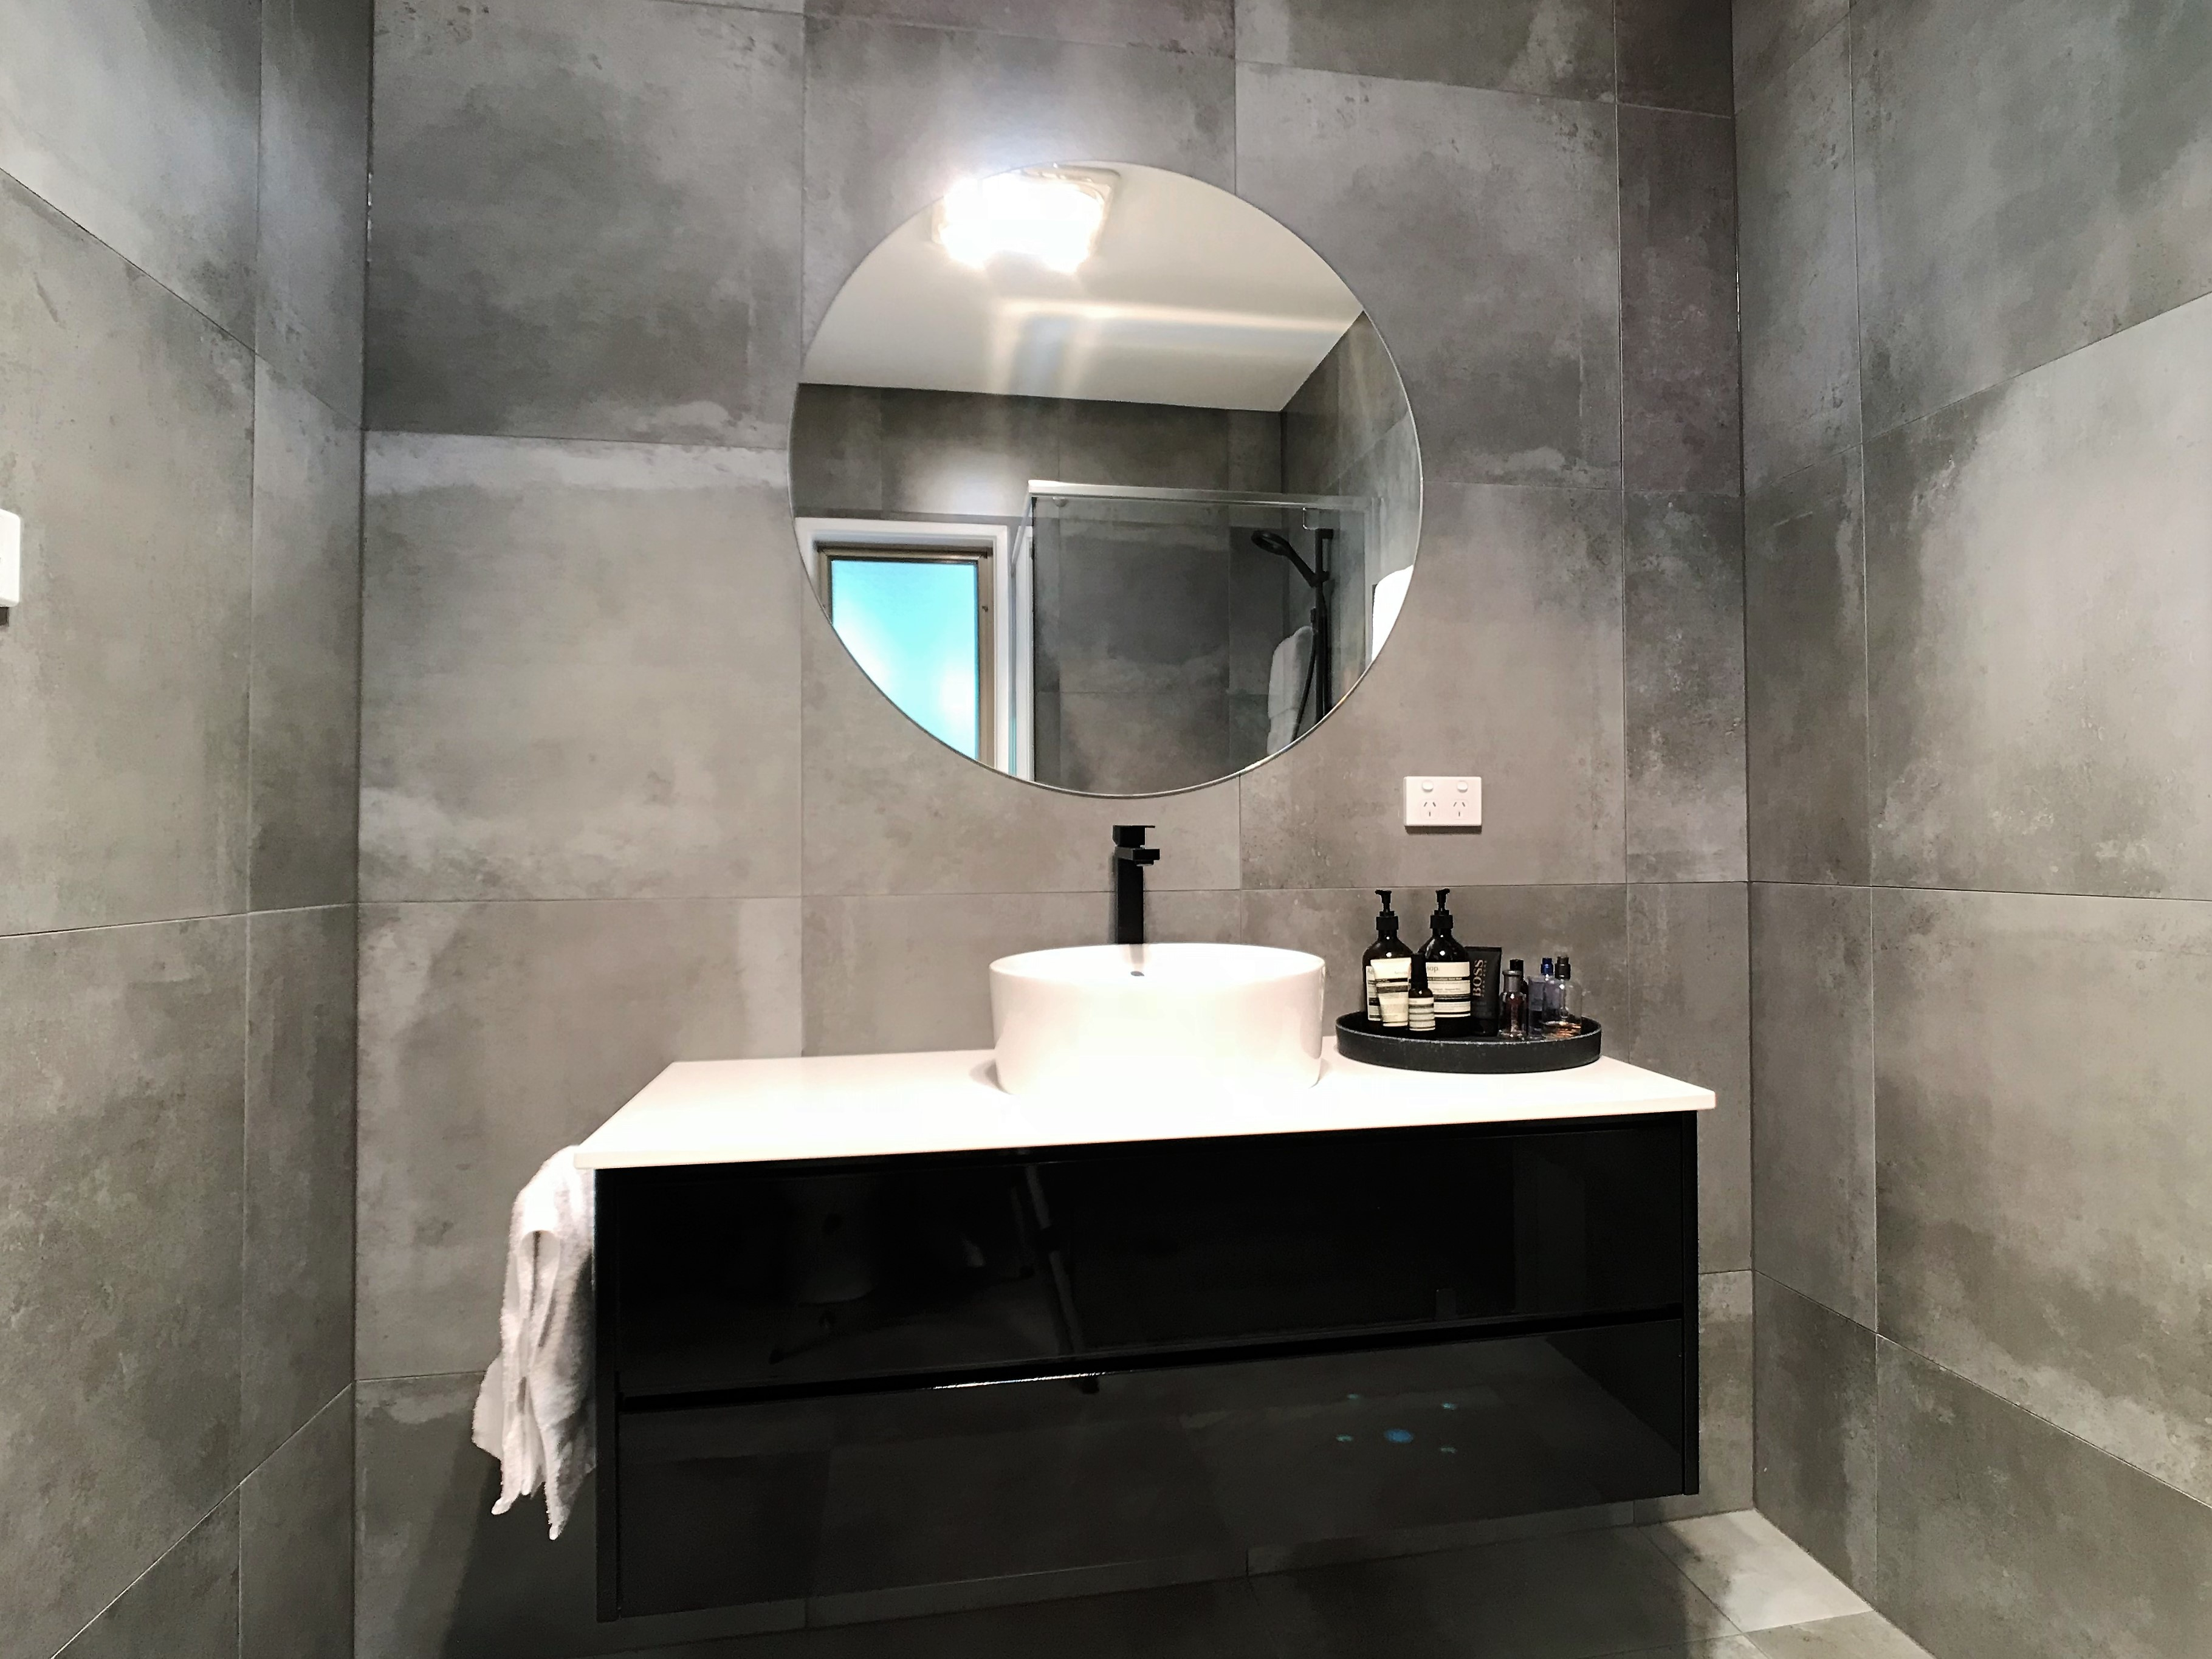 Stylish bathroom with round mirror and stylish amenities. - Bathroom Renovation